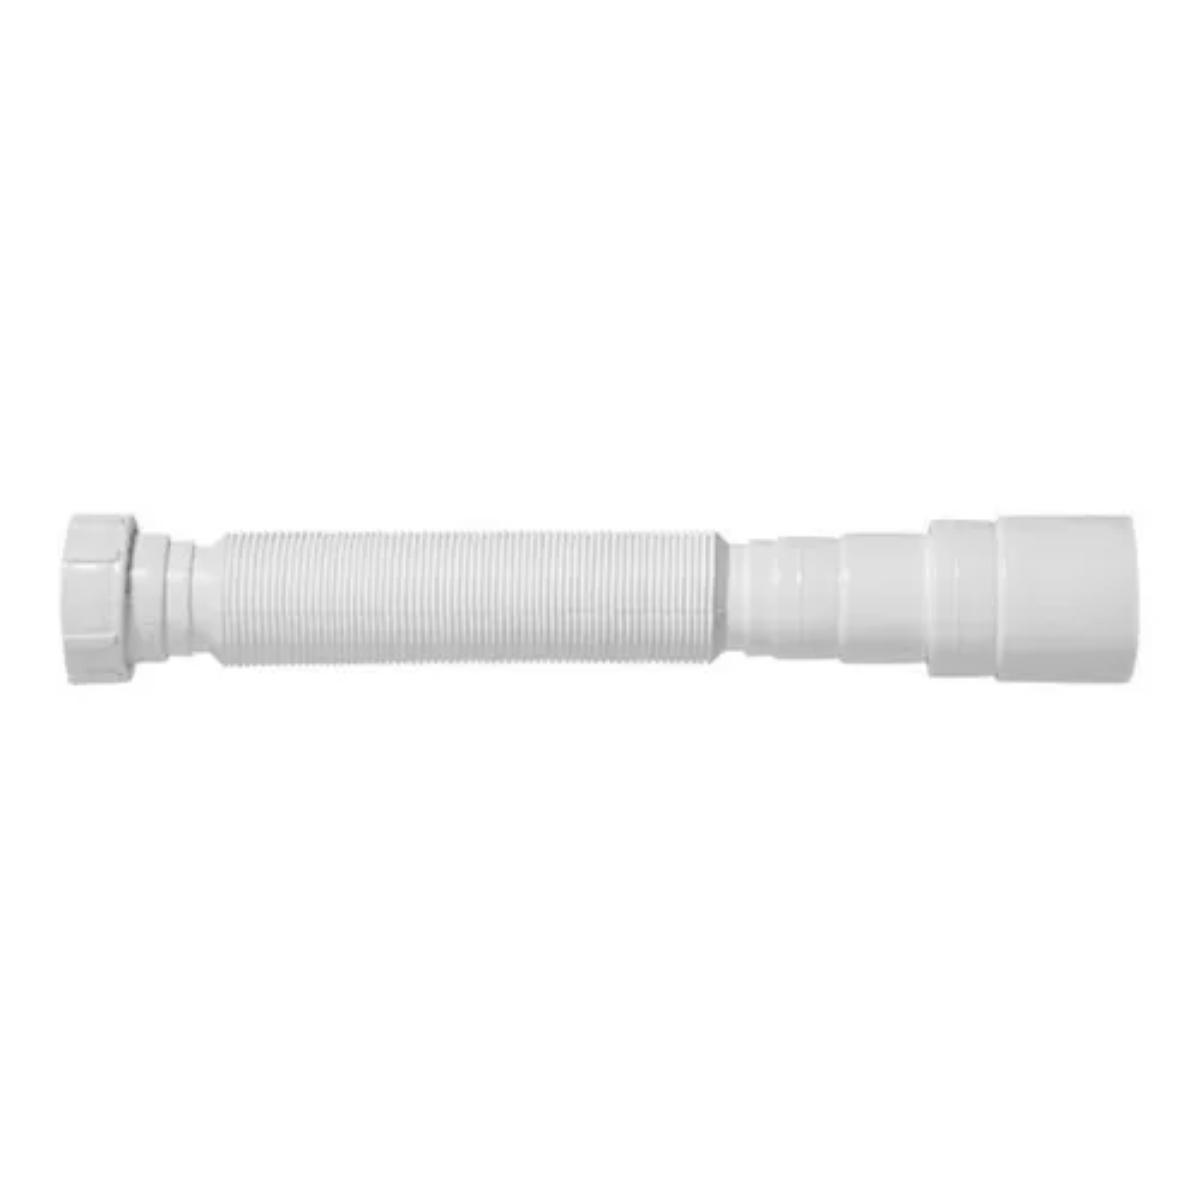 Sifão Tubo Extensivo Universal 72 cm Branco 030101 Blukit